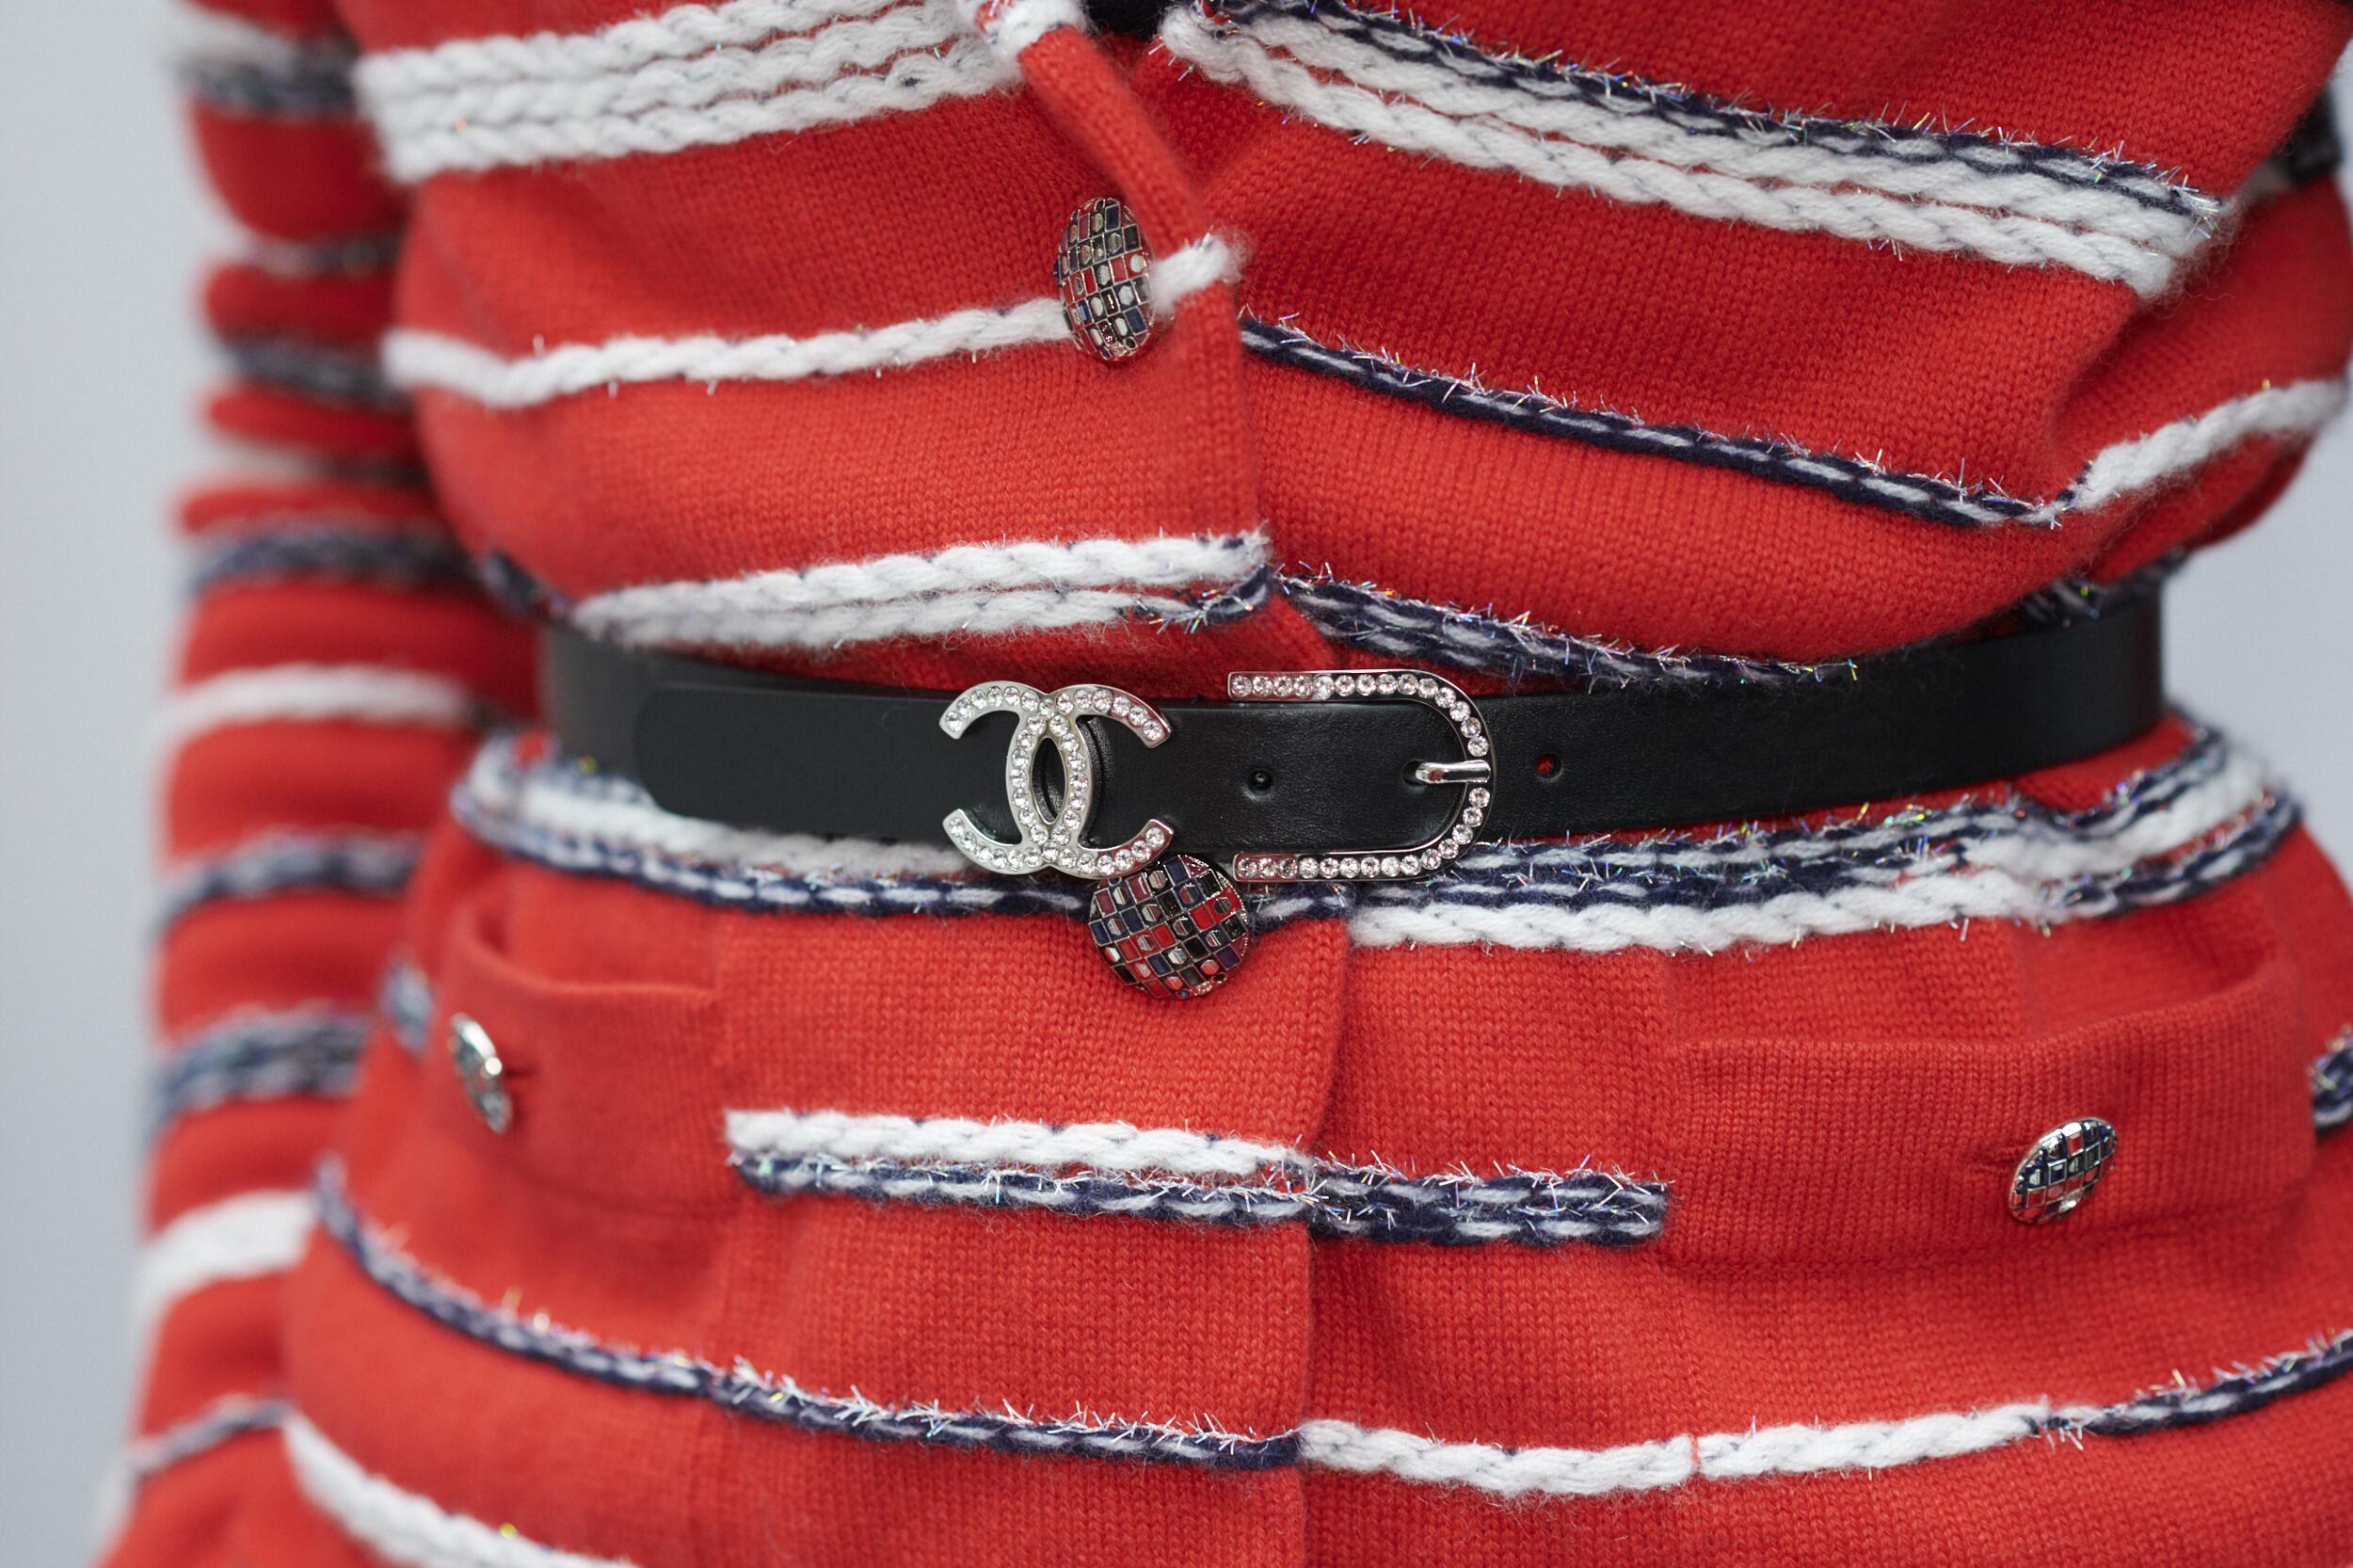 2020 Belt Chanel